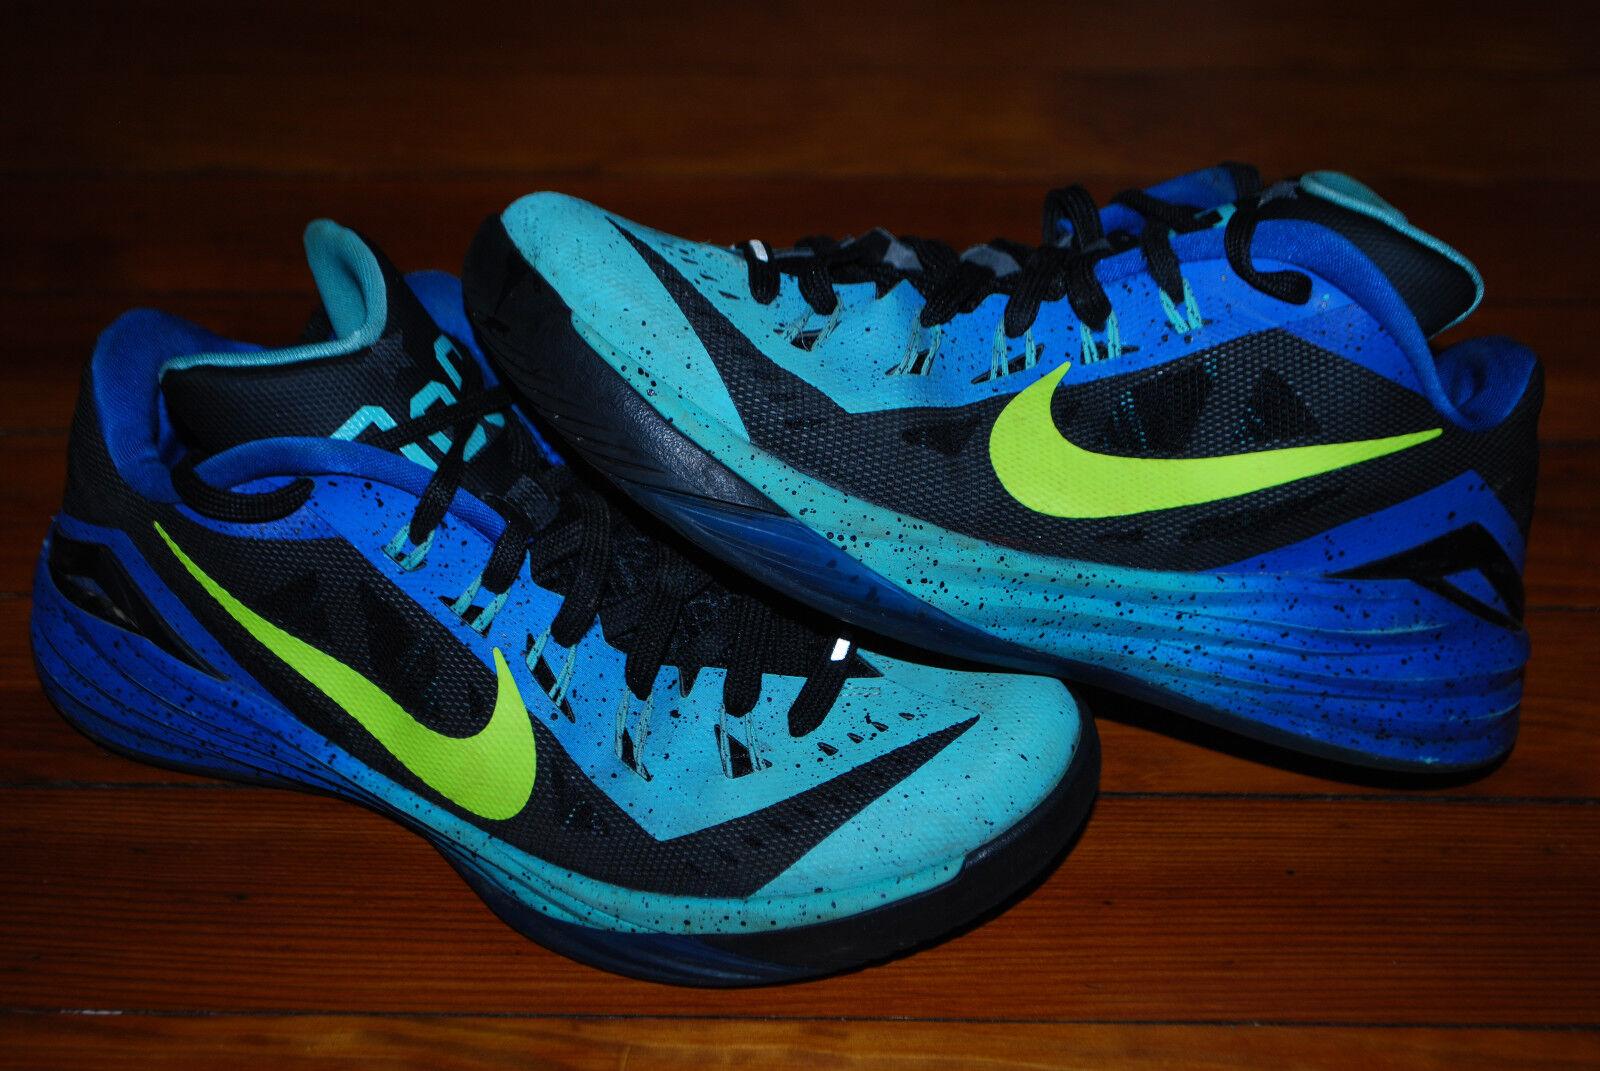 Gli uomini sono nike hyperdunk basso city pack - washington dc scarpe da ginnastica (8) 706503-073